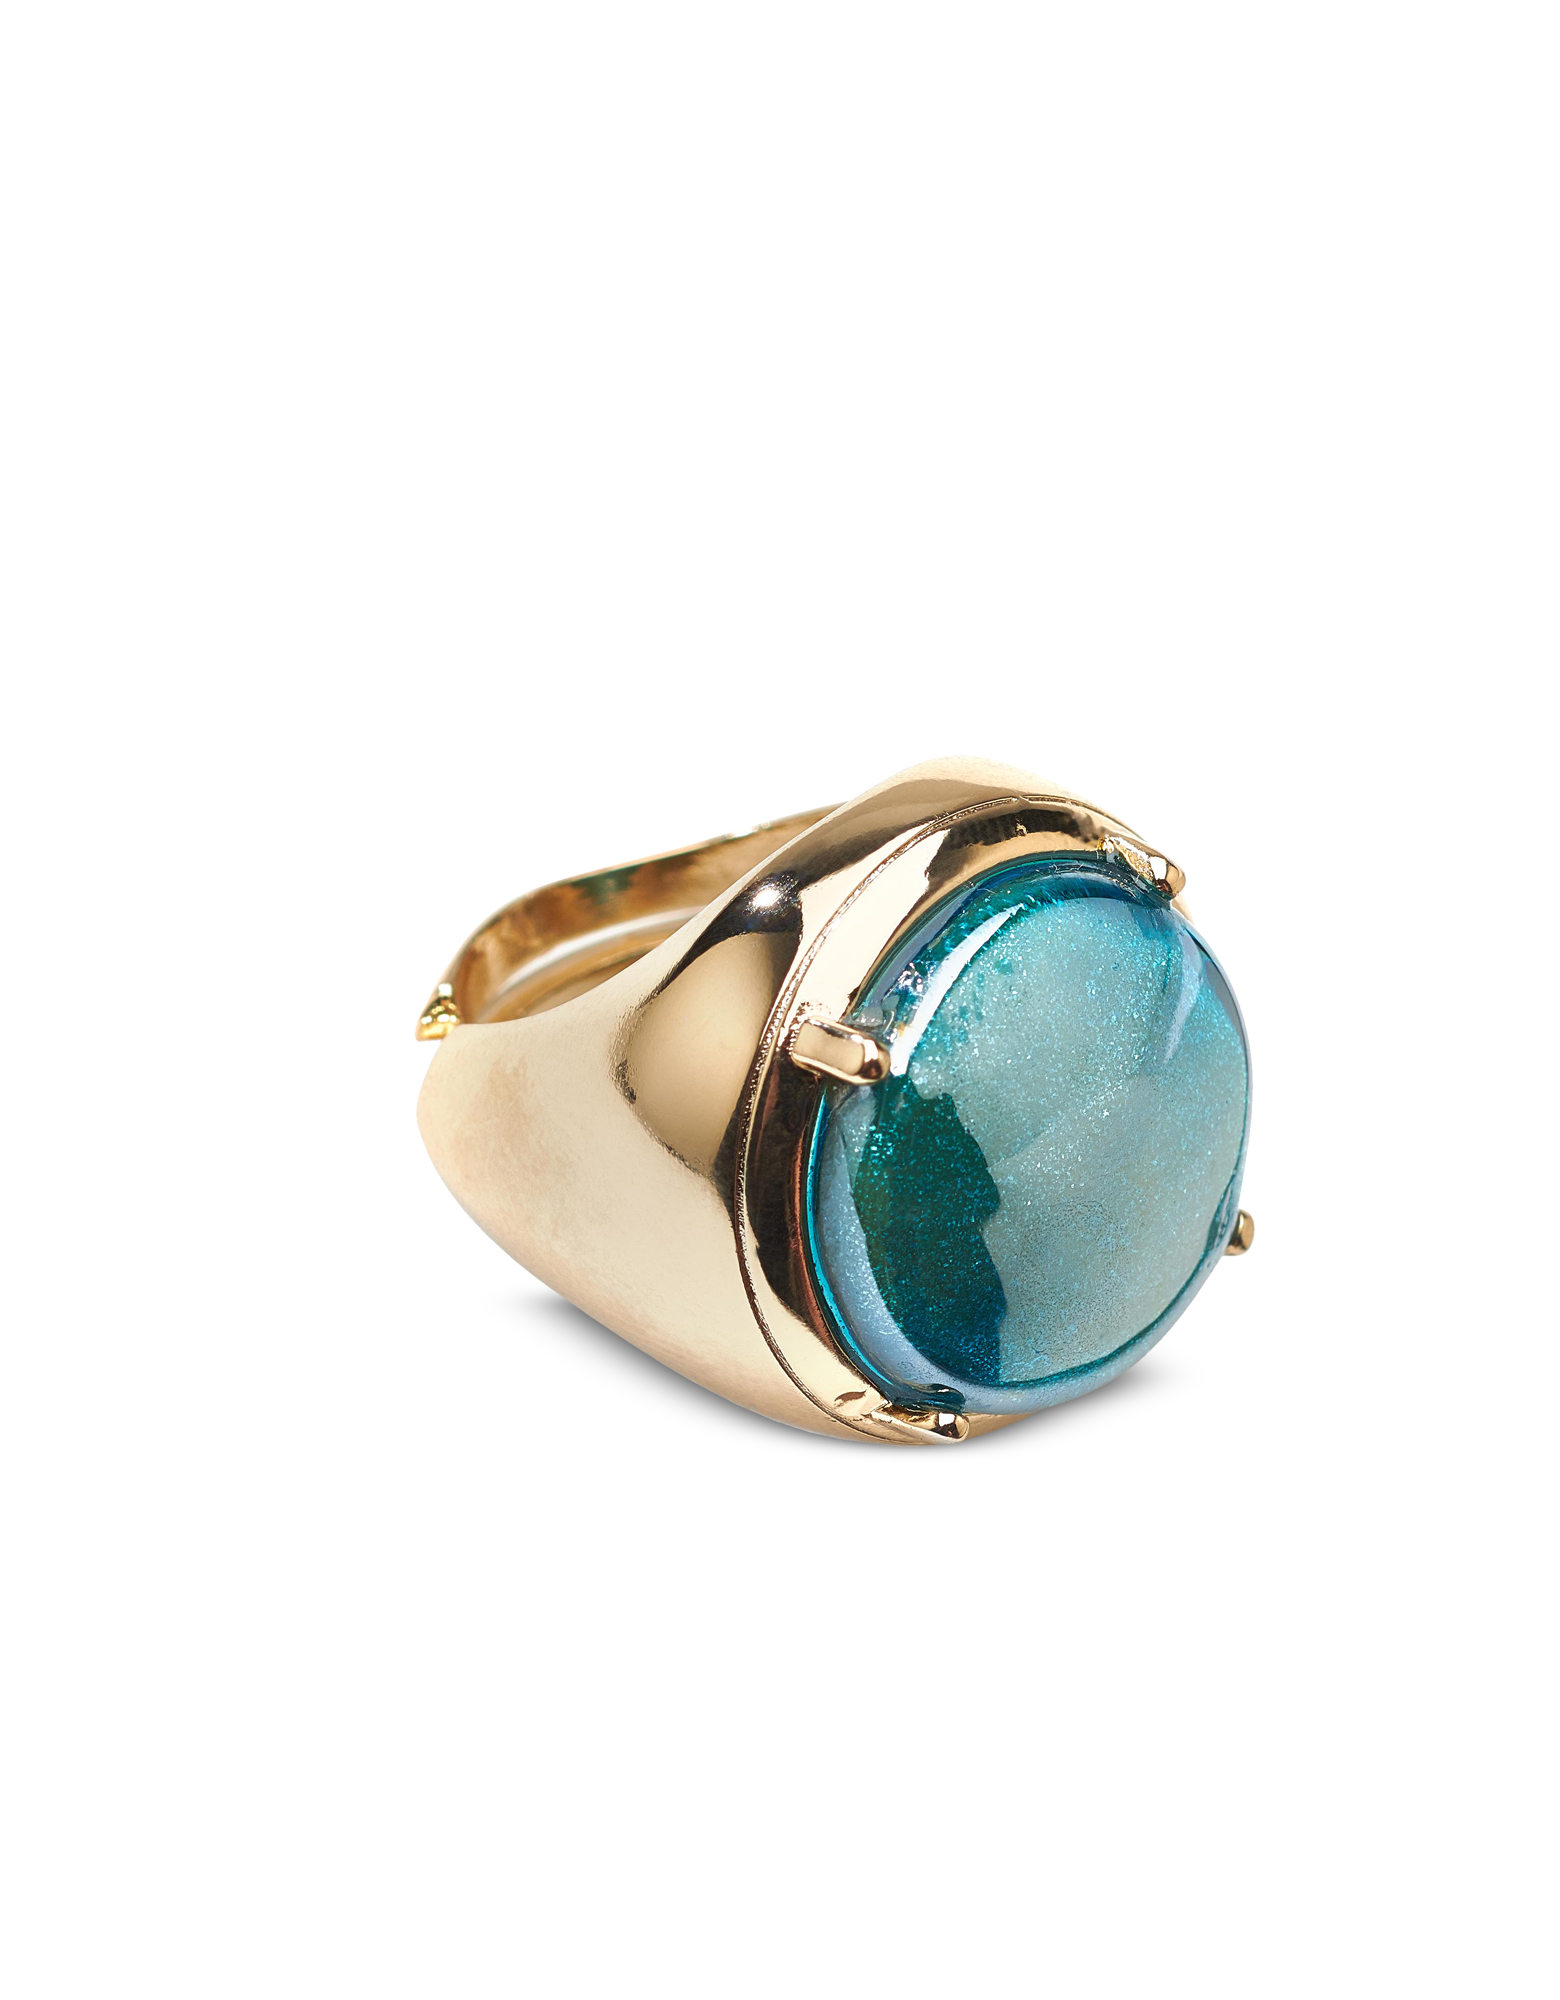 Image of Avogaria Ring